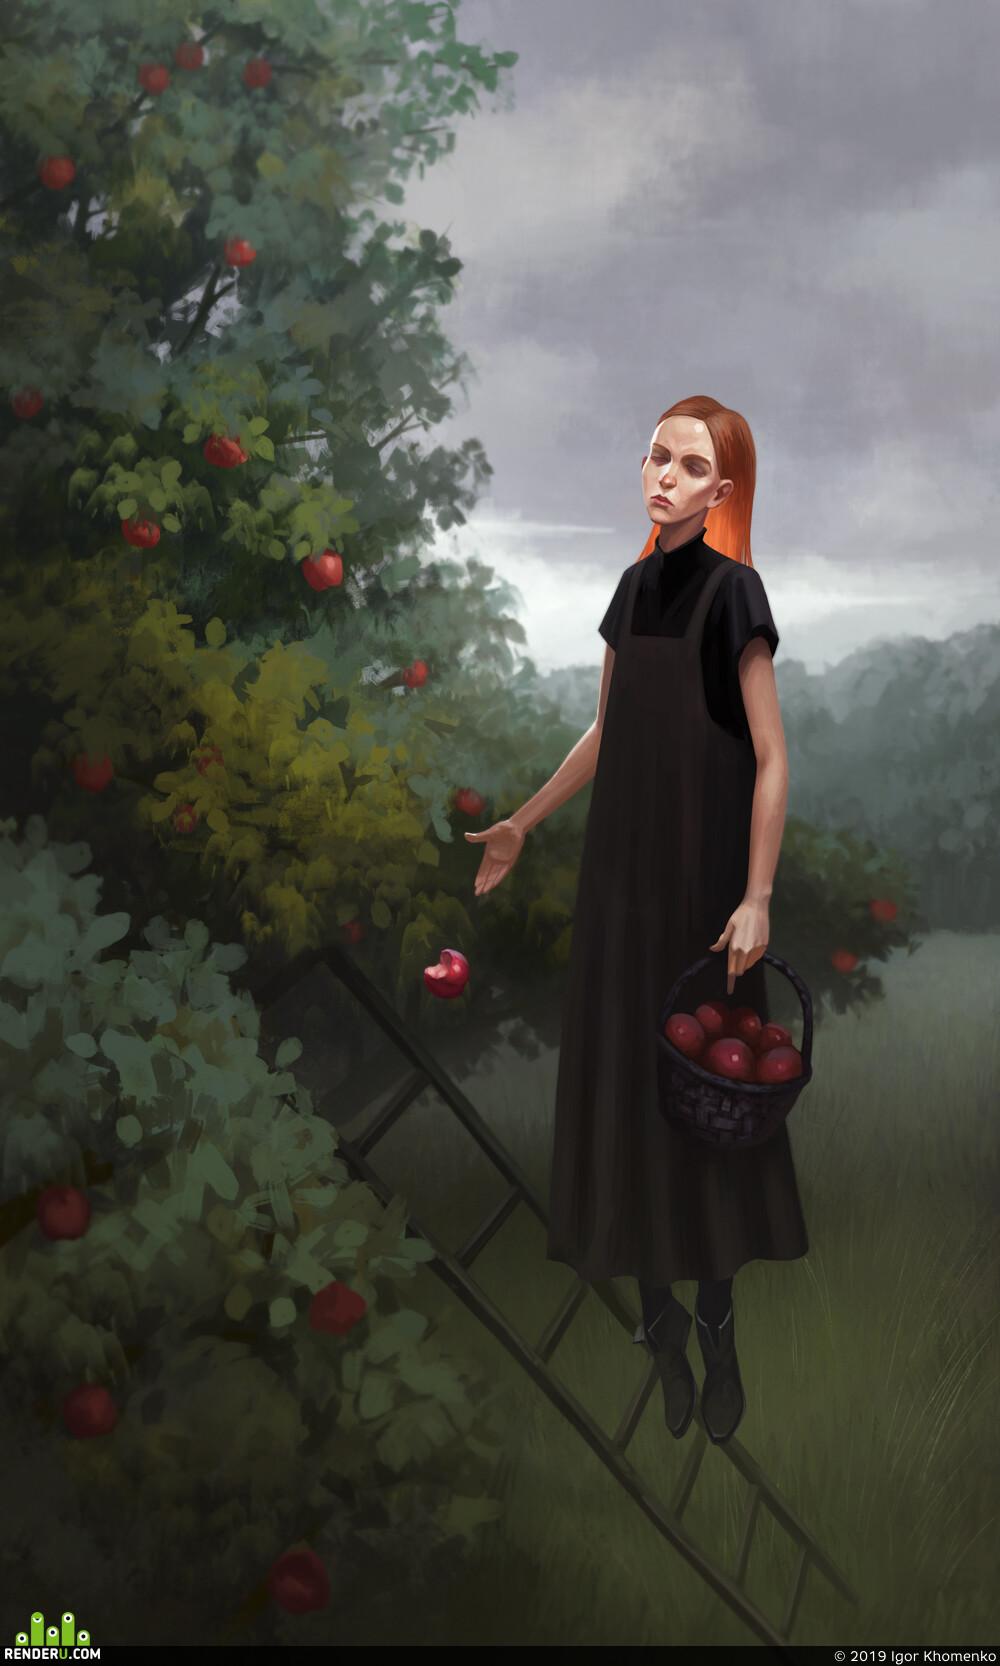 atmosphere, mood, concept, illustration